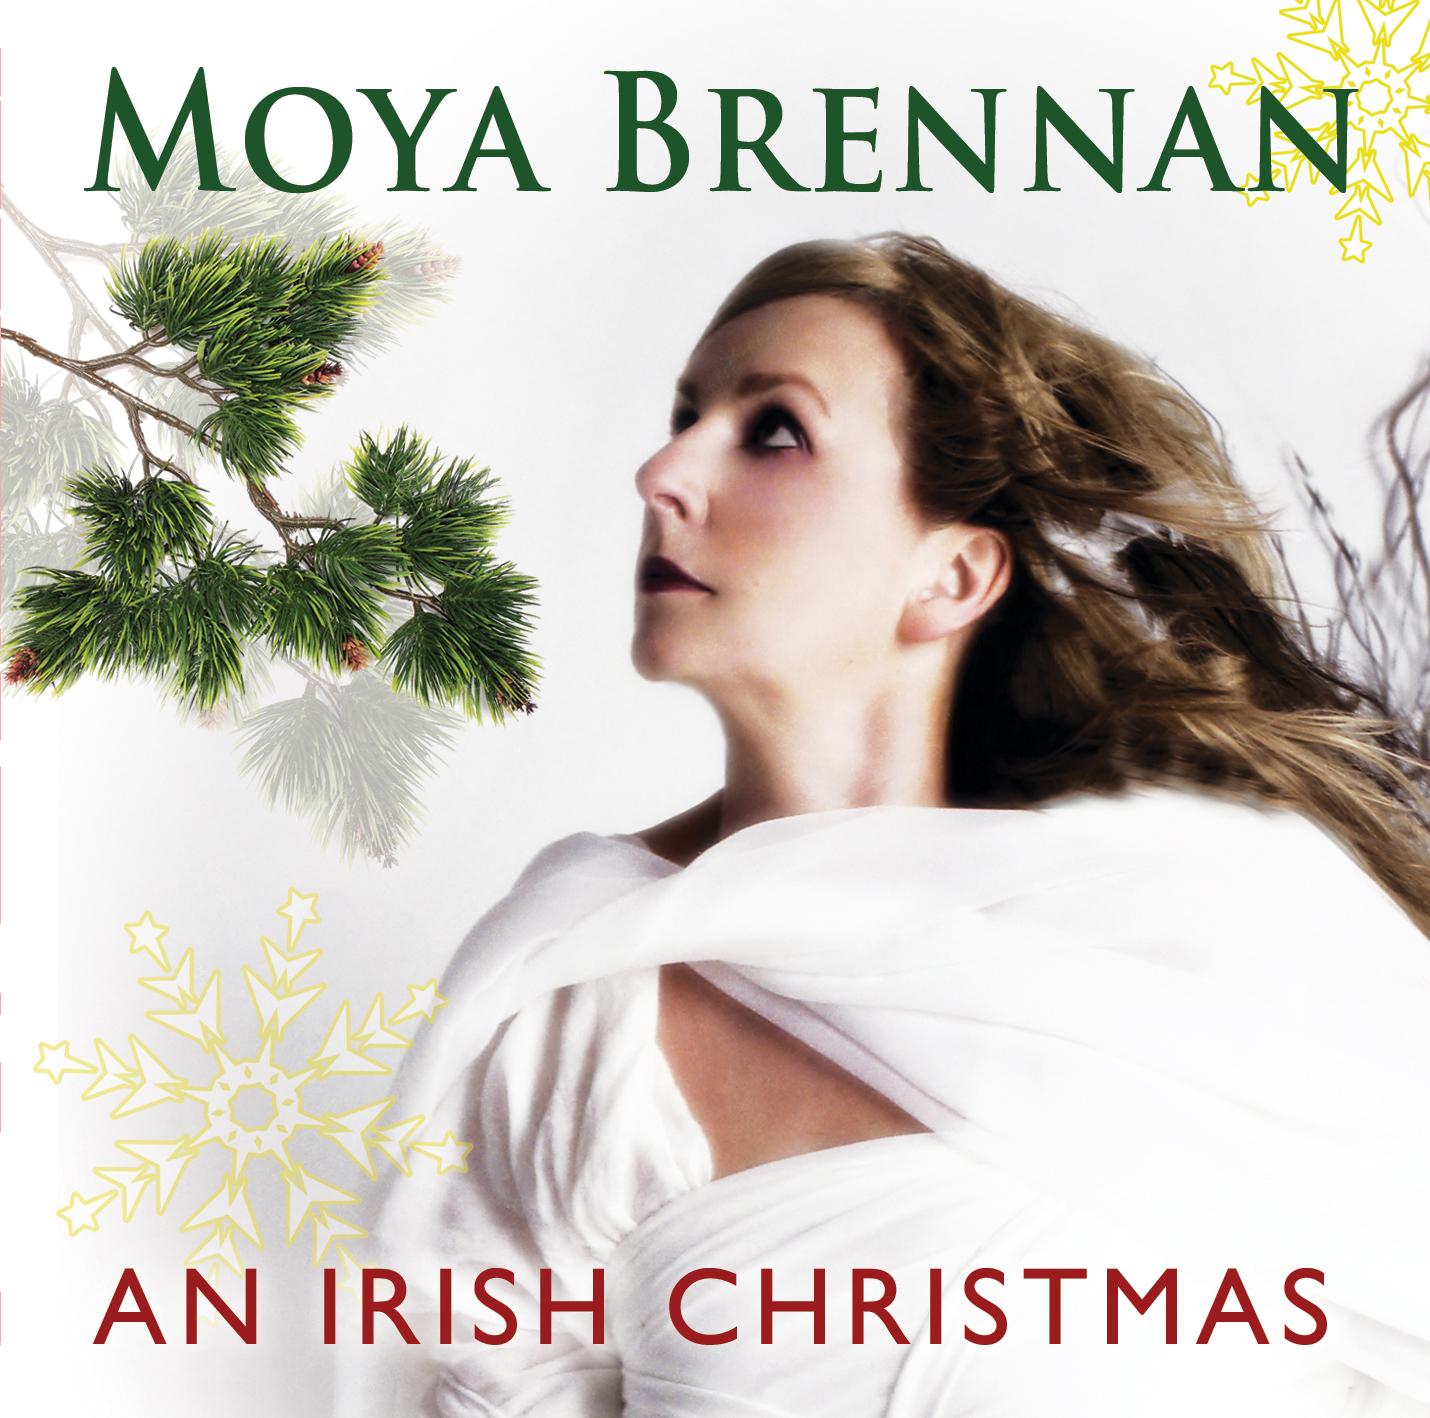 Moya Brennan \'An Irish Christmas\' at Connelly\'s The Klub 45 12/07 ...